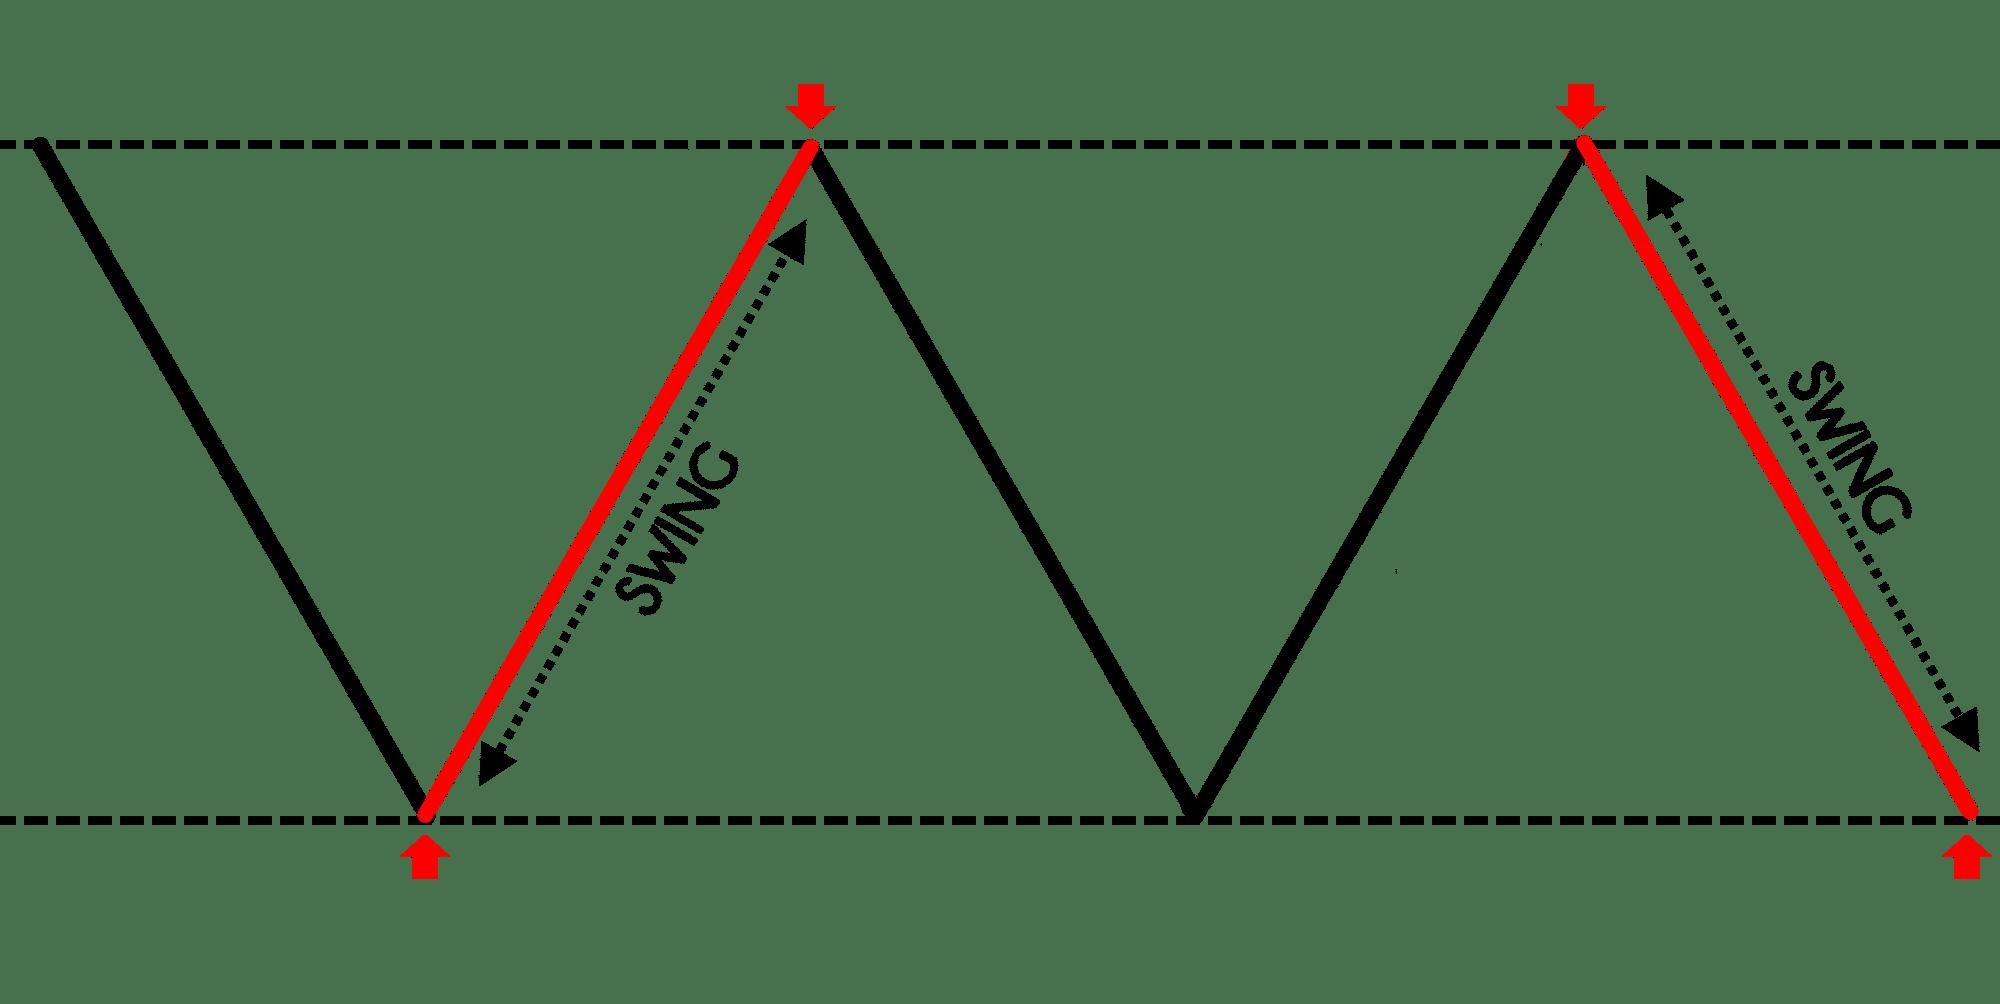 Estrategias de trading que funcionan | TradingwithRayner